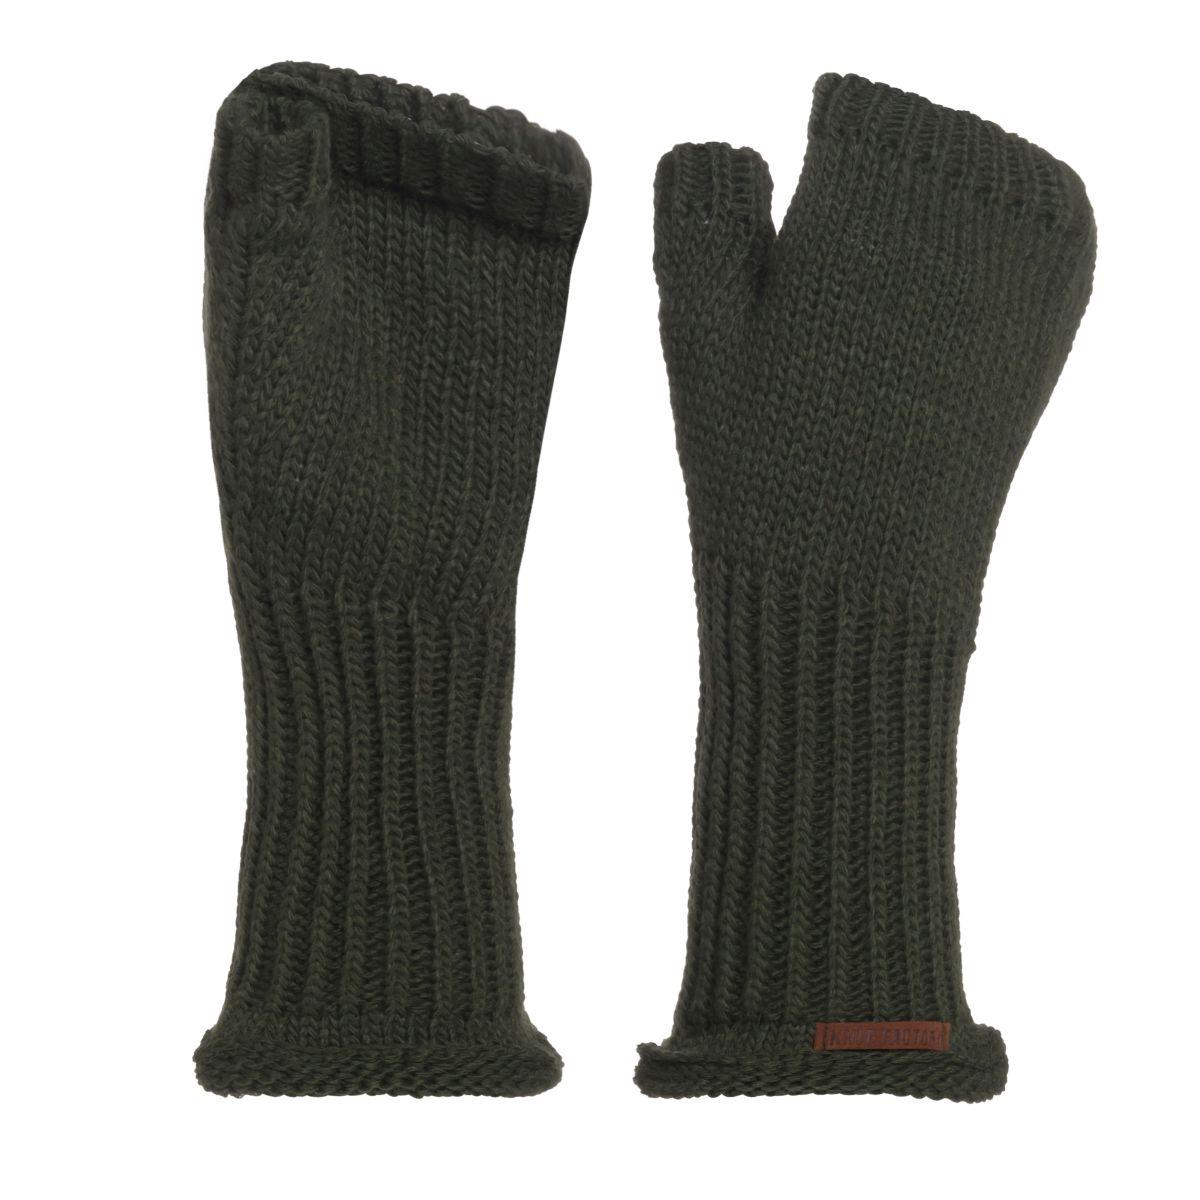 knit factory kf14607502550 cleo handschoenen khaki 1